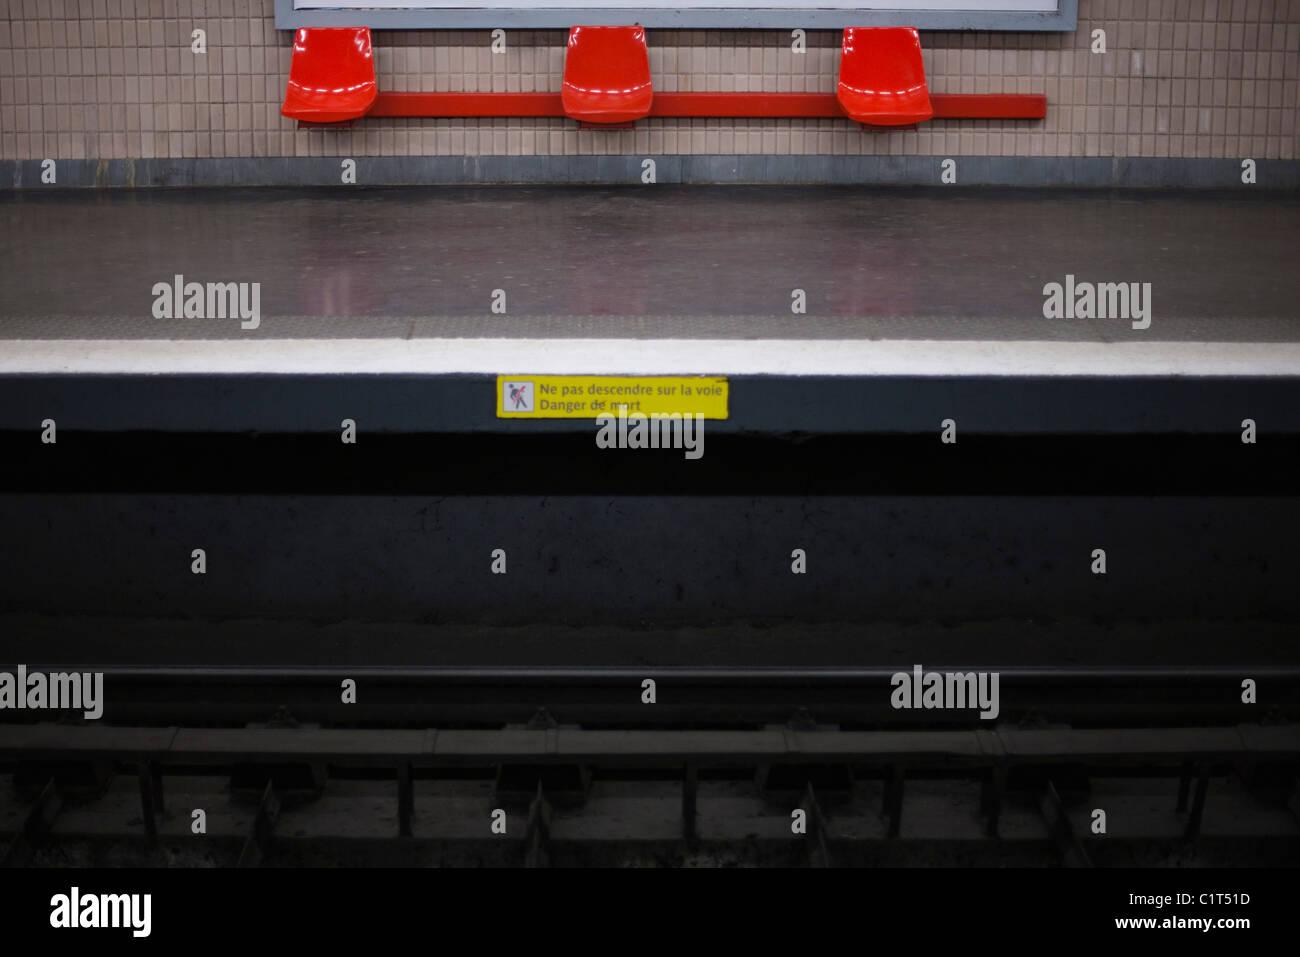 Empty subway platform - Stock Image